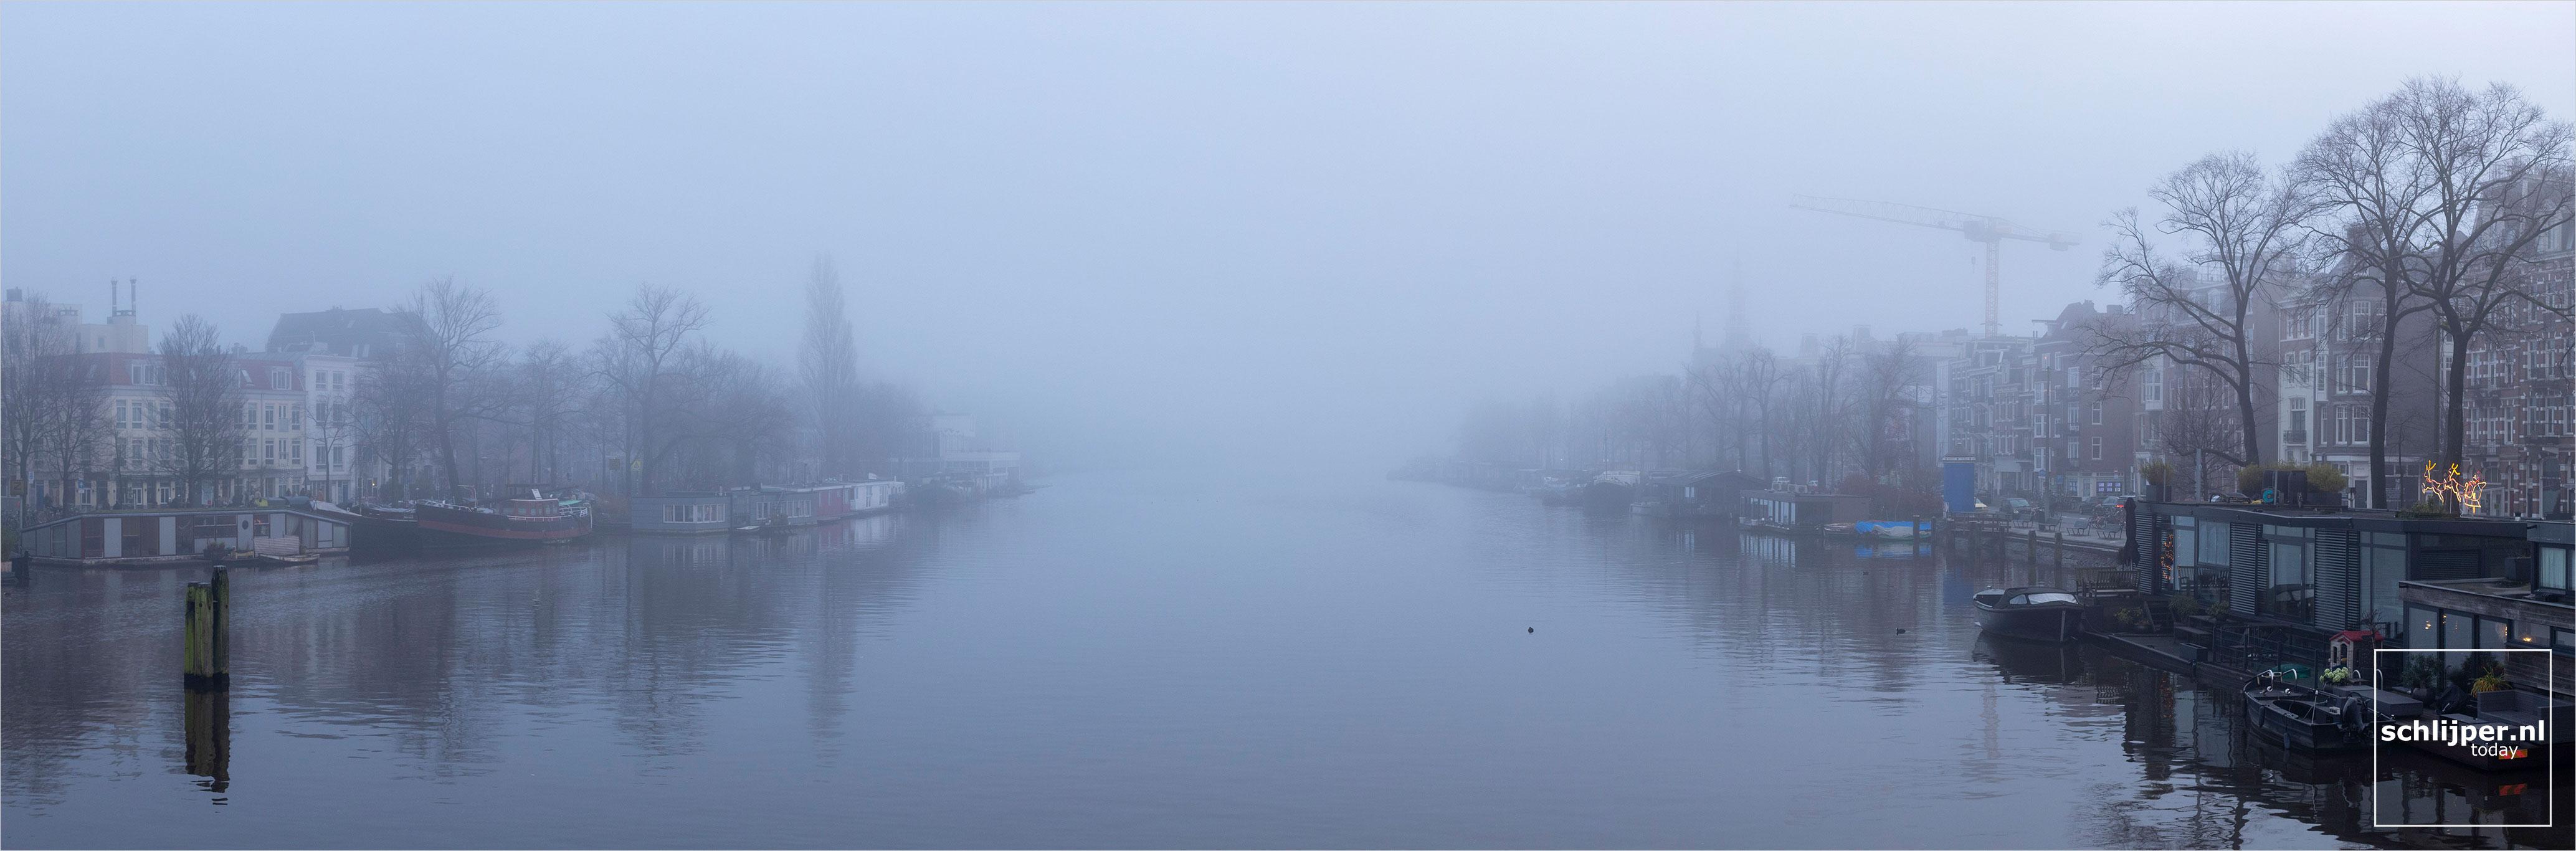 The Netherlands, Amsterdam, 2 januari 2021